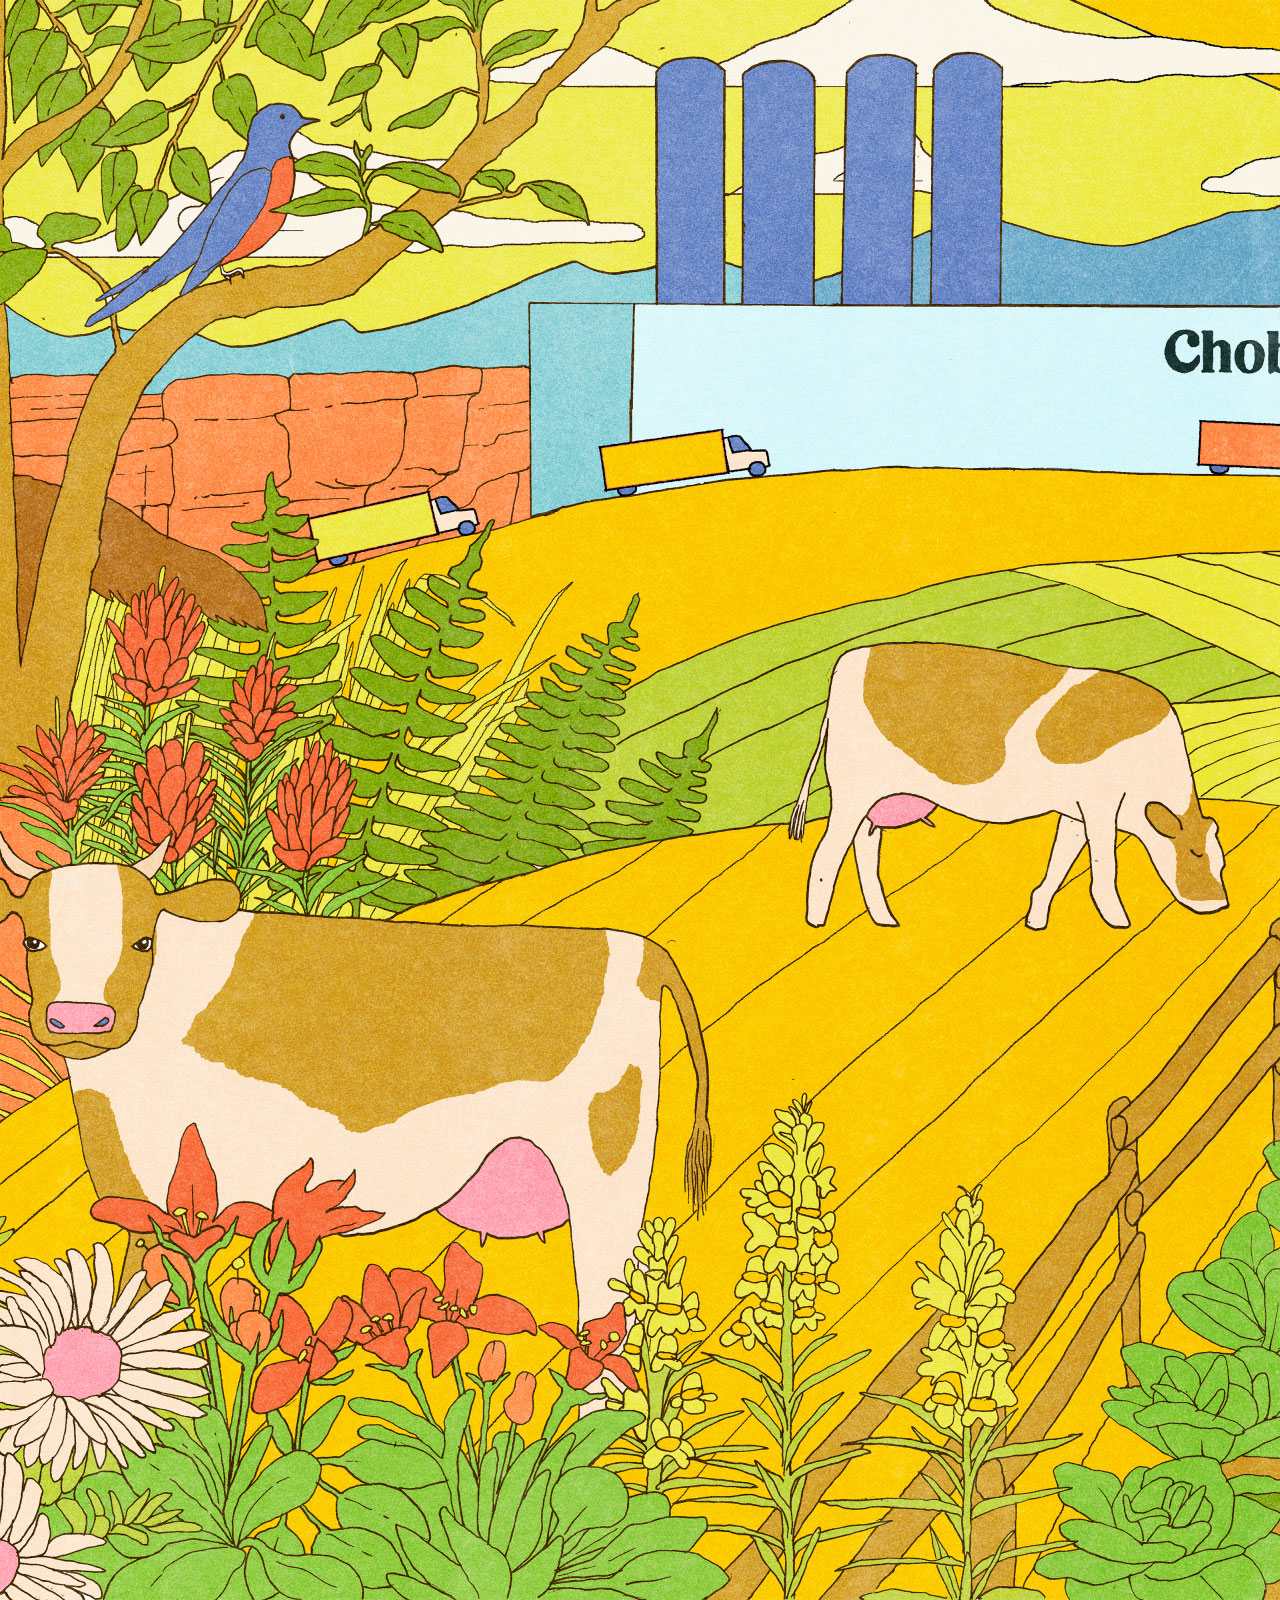 chobani factory illustration